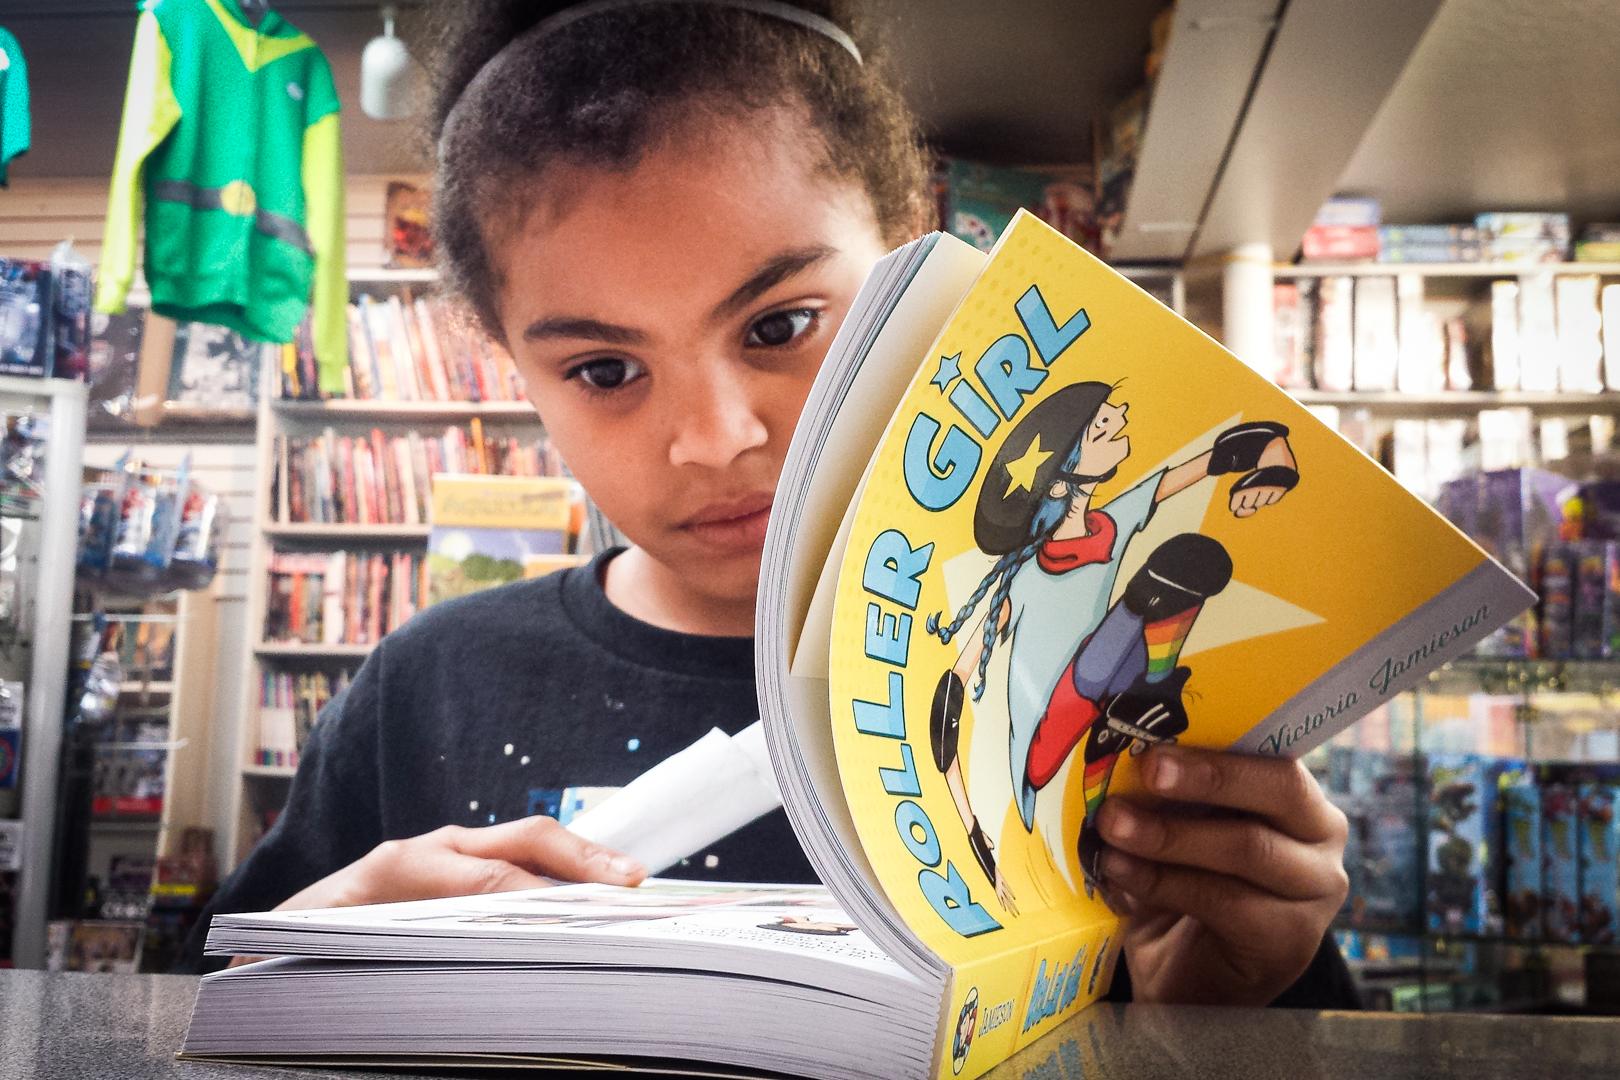 Superhero Set Aims To Rewrite Comic Lack Of Diversity